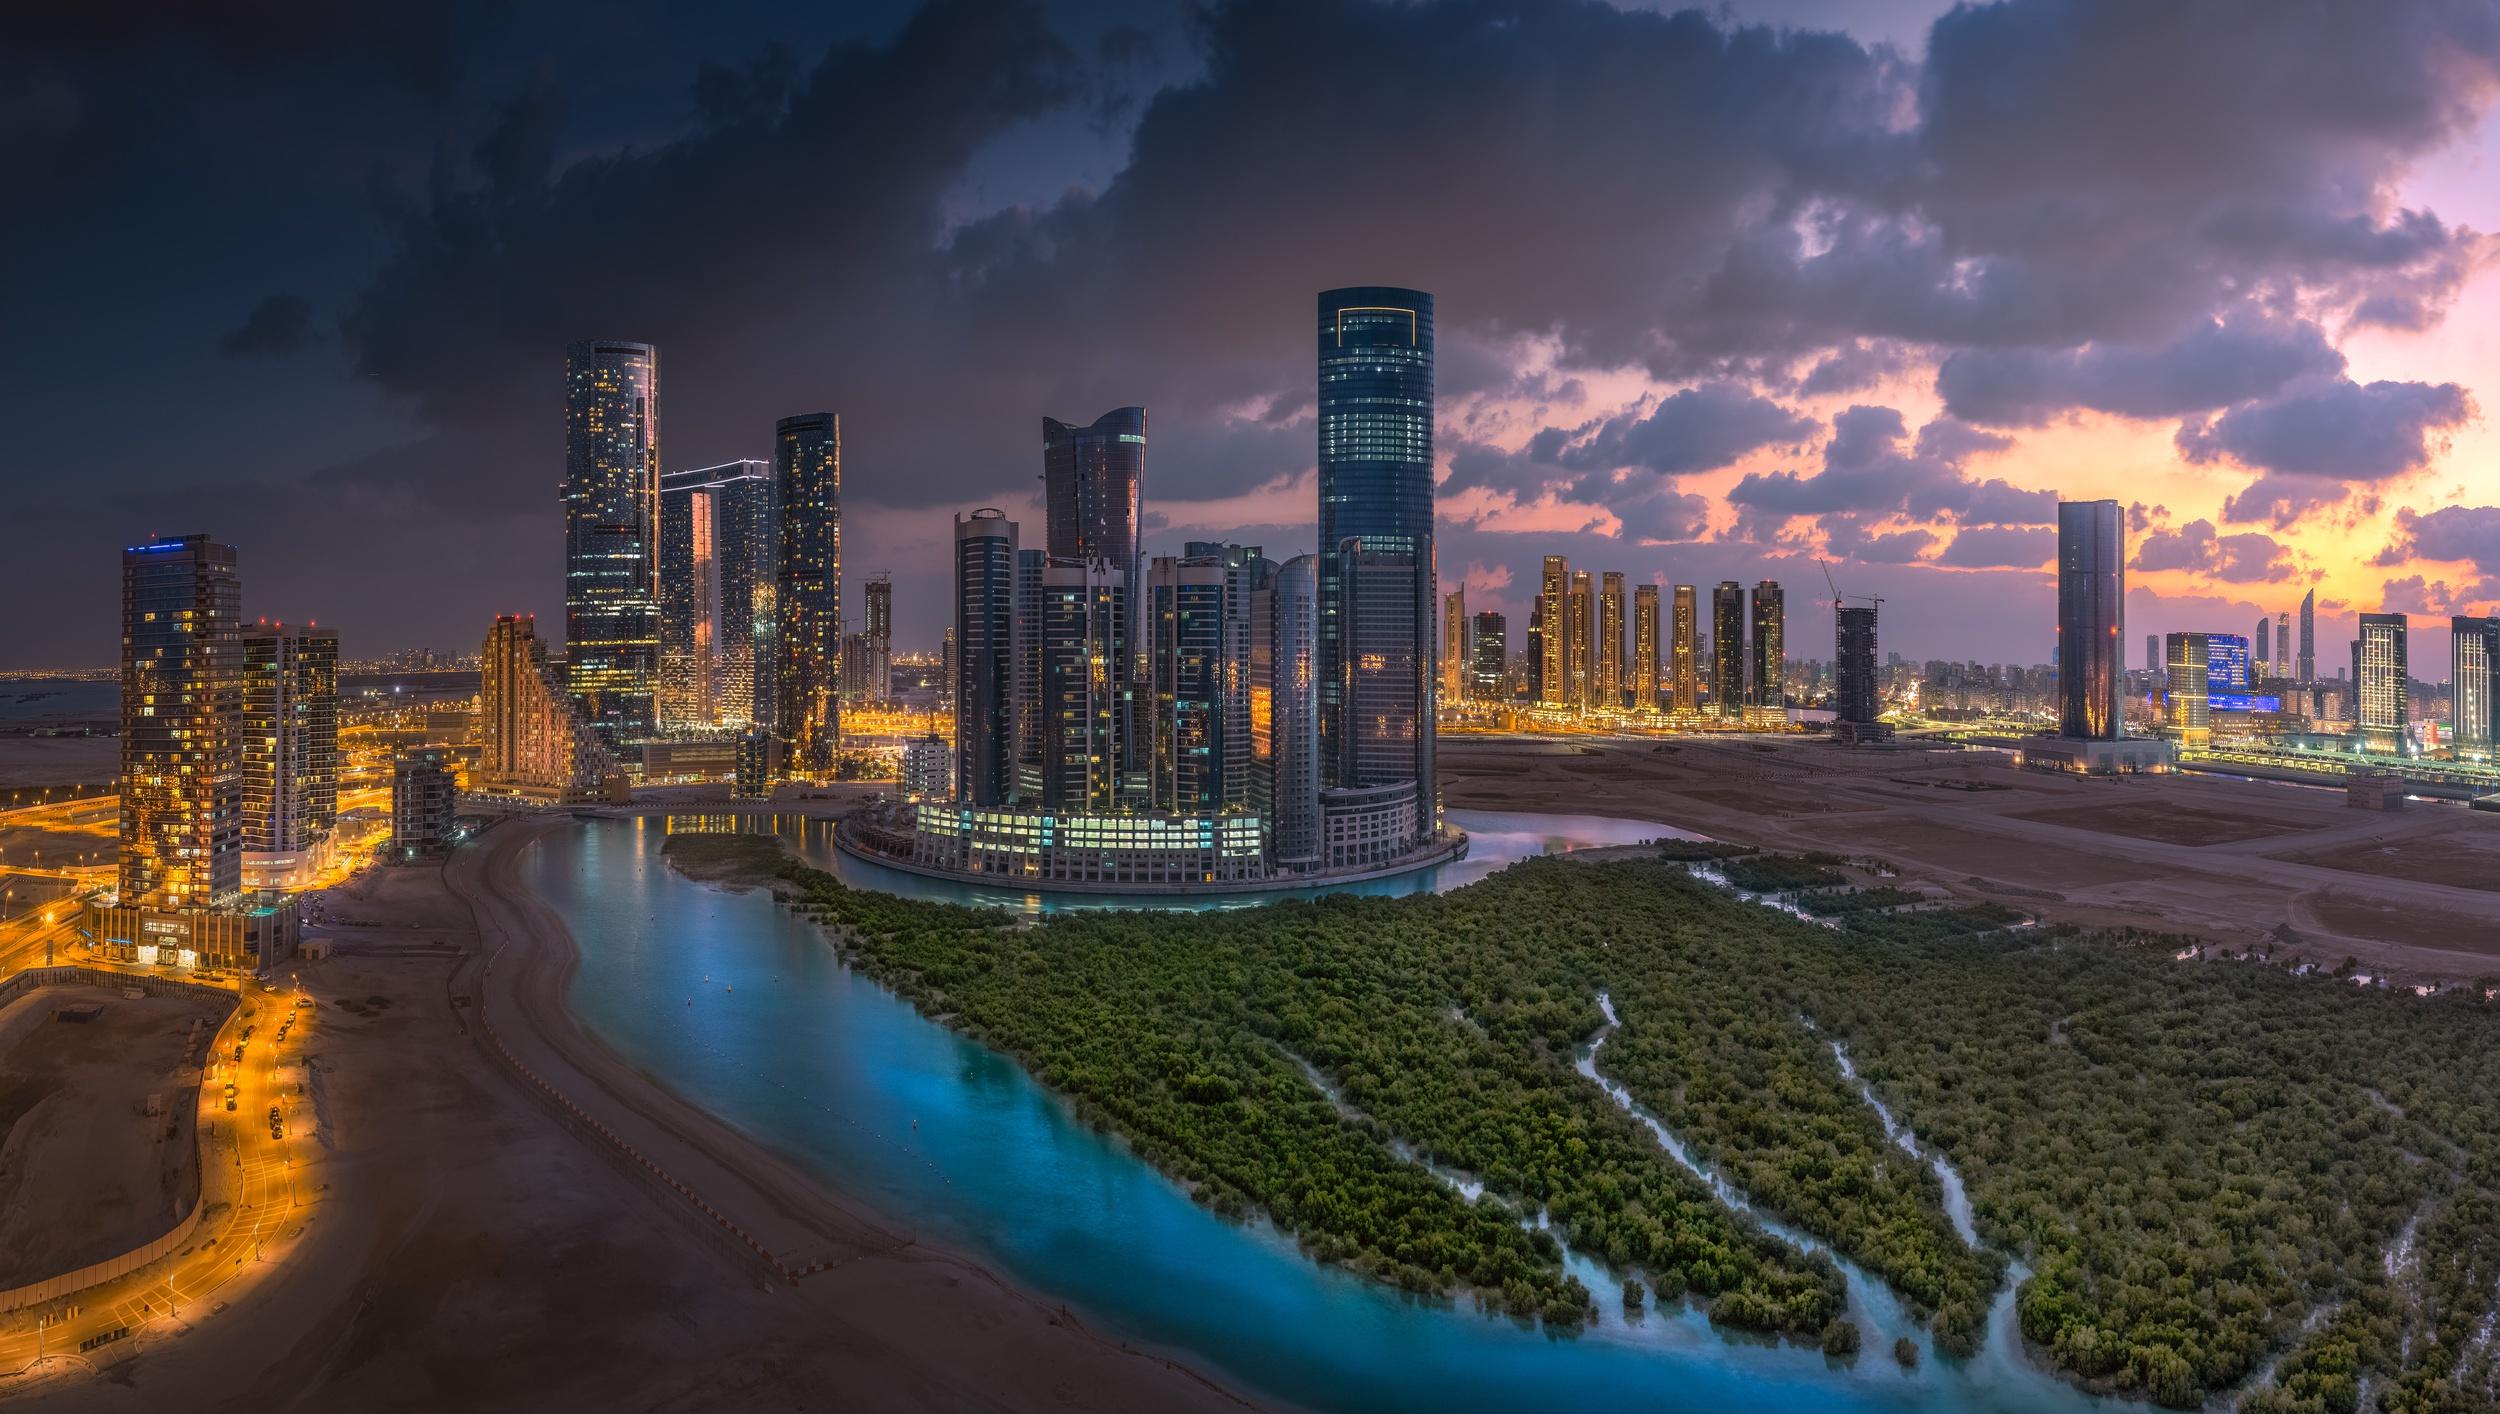 Abu Dhabi: Night, City, Building, Abu Dhabi, Skyscraper, United Arab Emirates